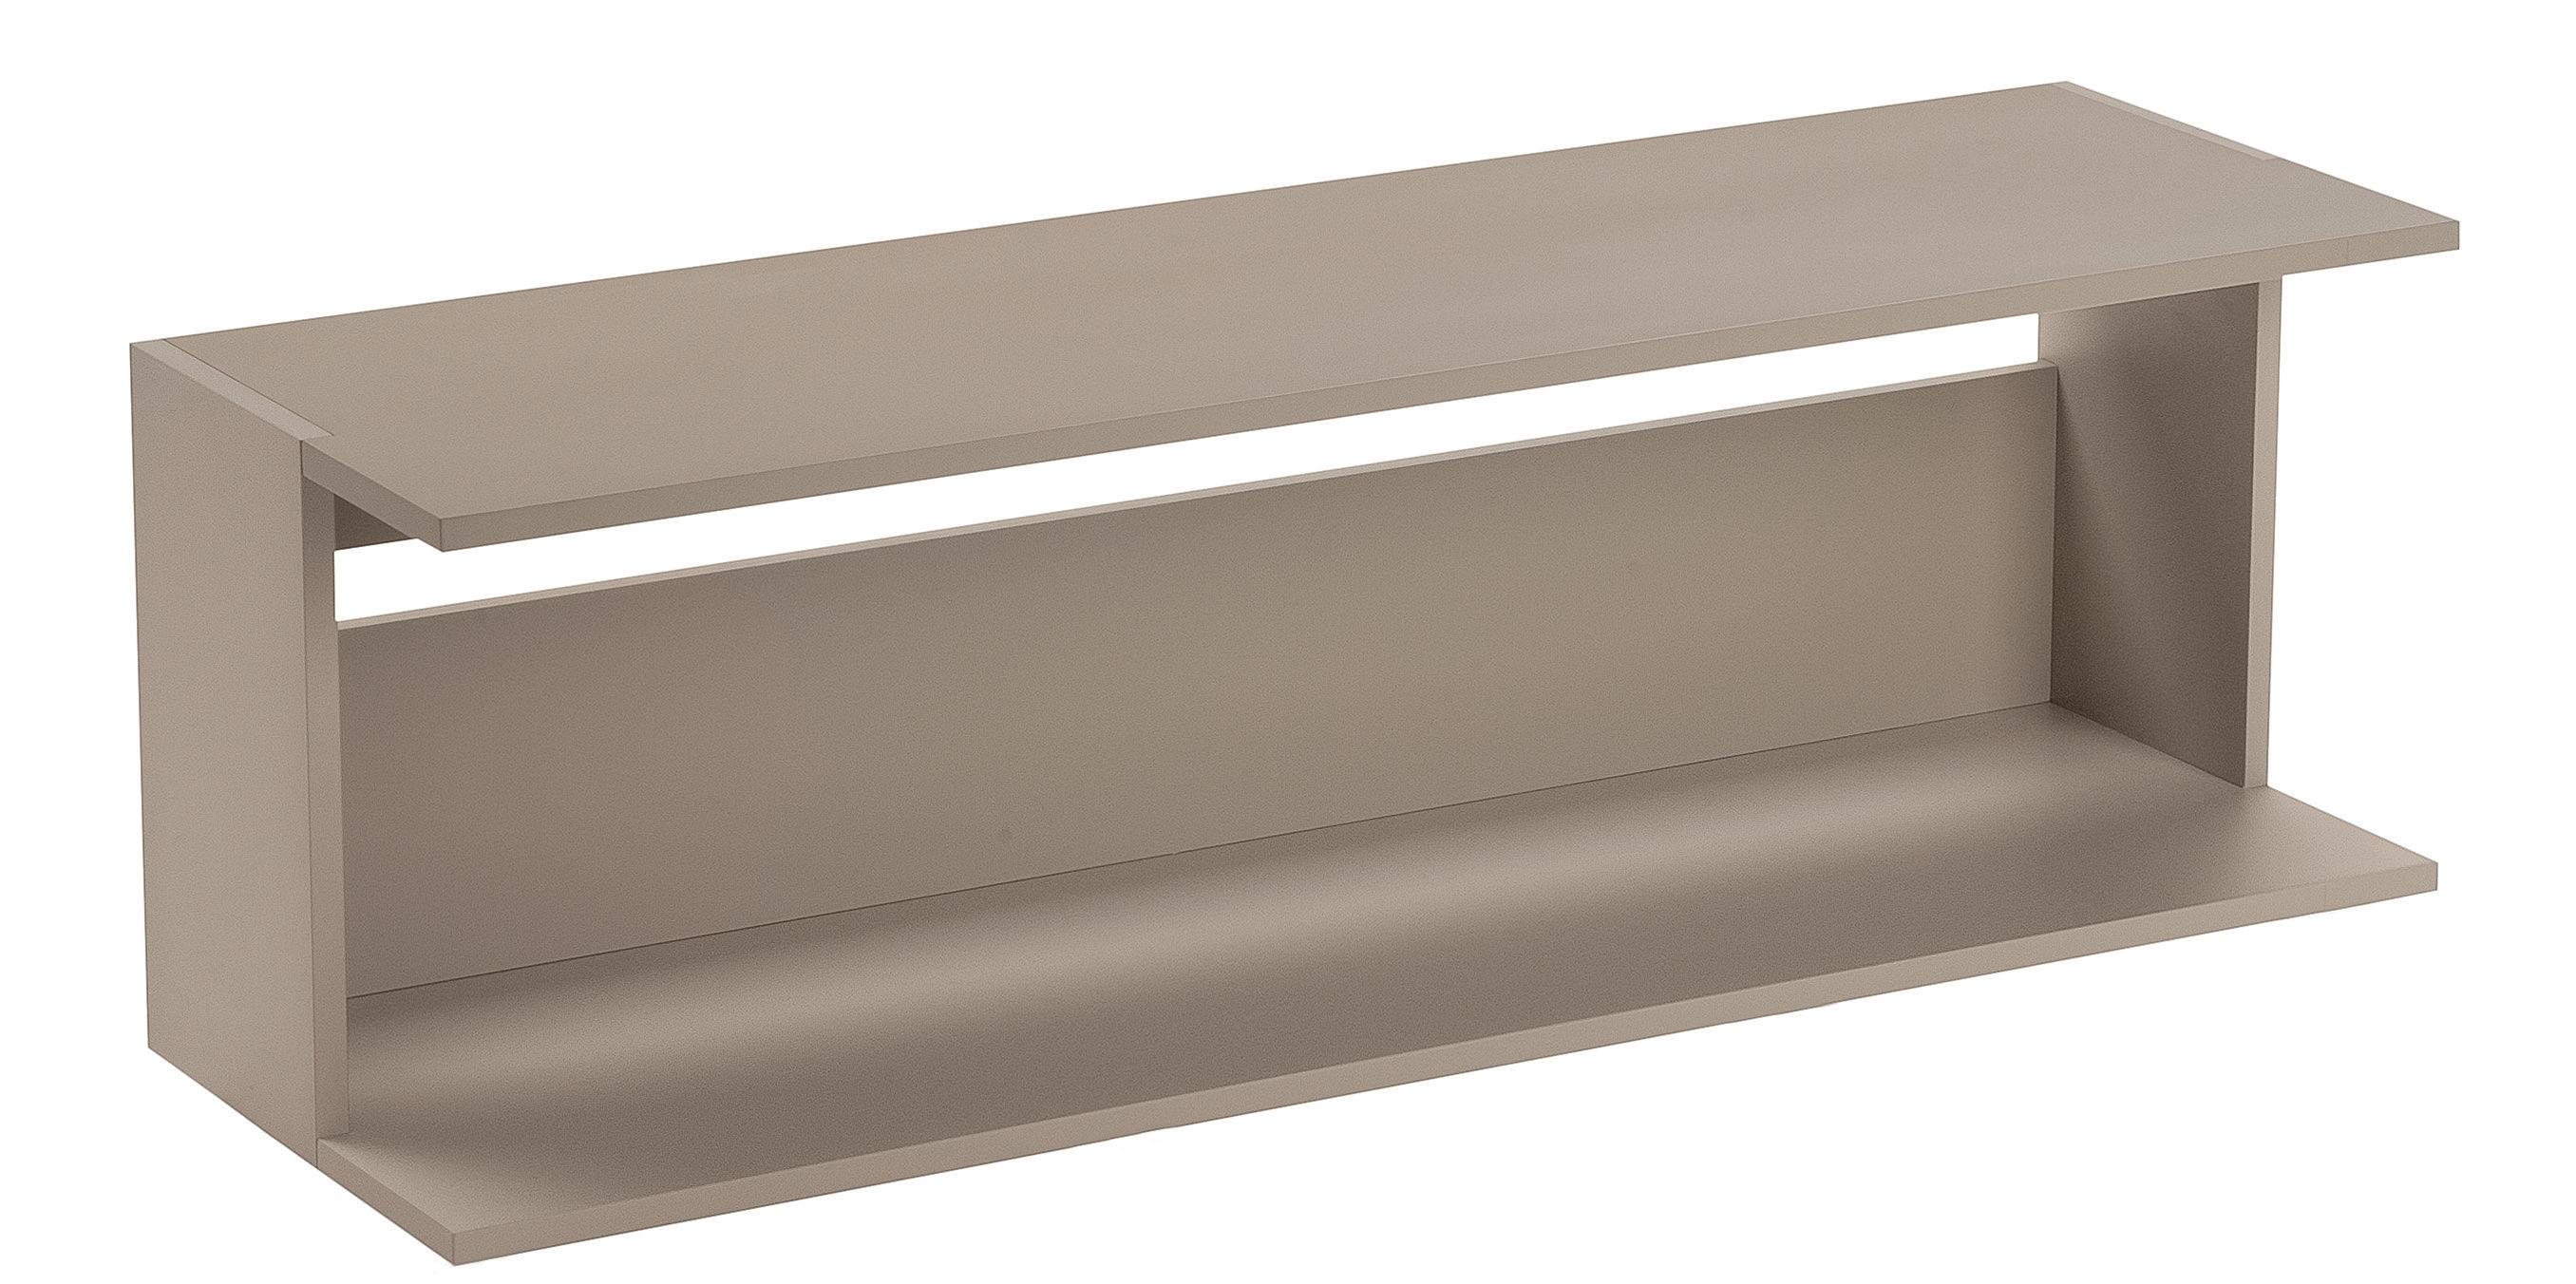 Mobilier - Tables basses - Console basse Scott / L 108 cm - Zanotta - Beige - MDF verni